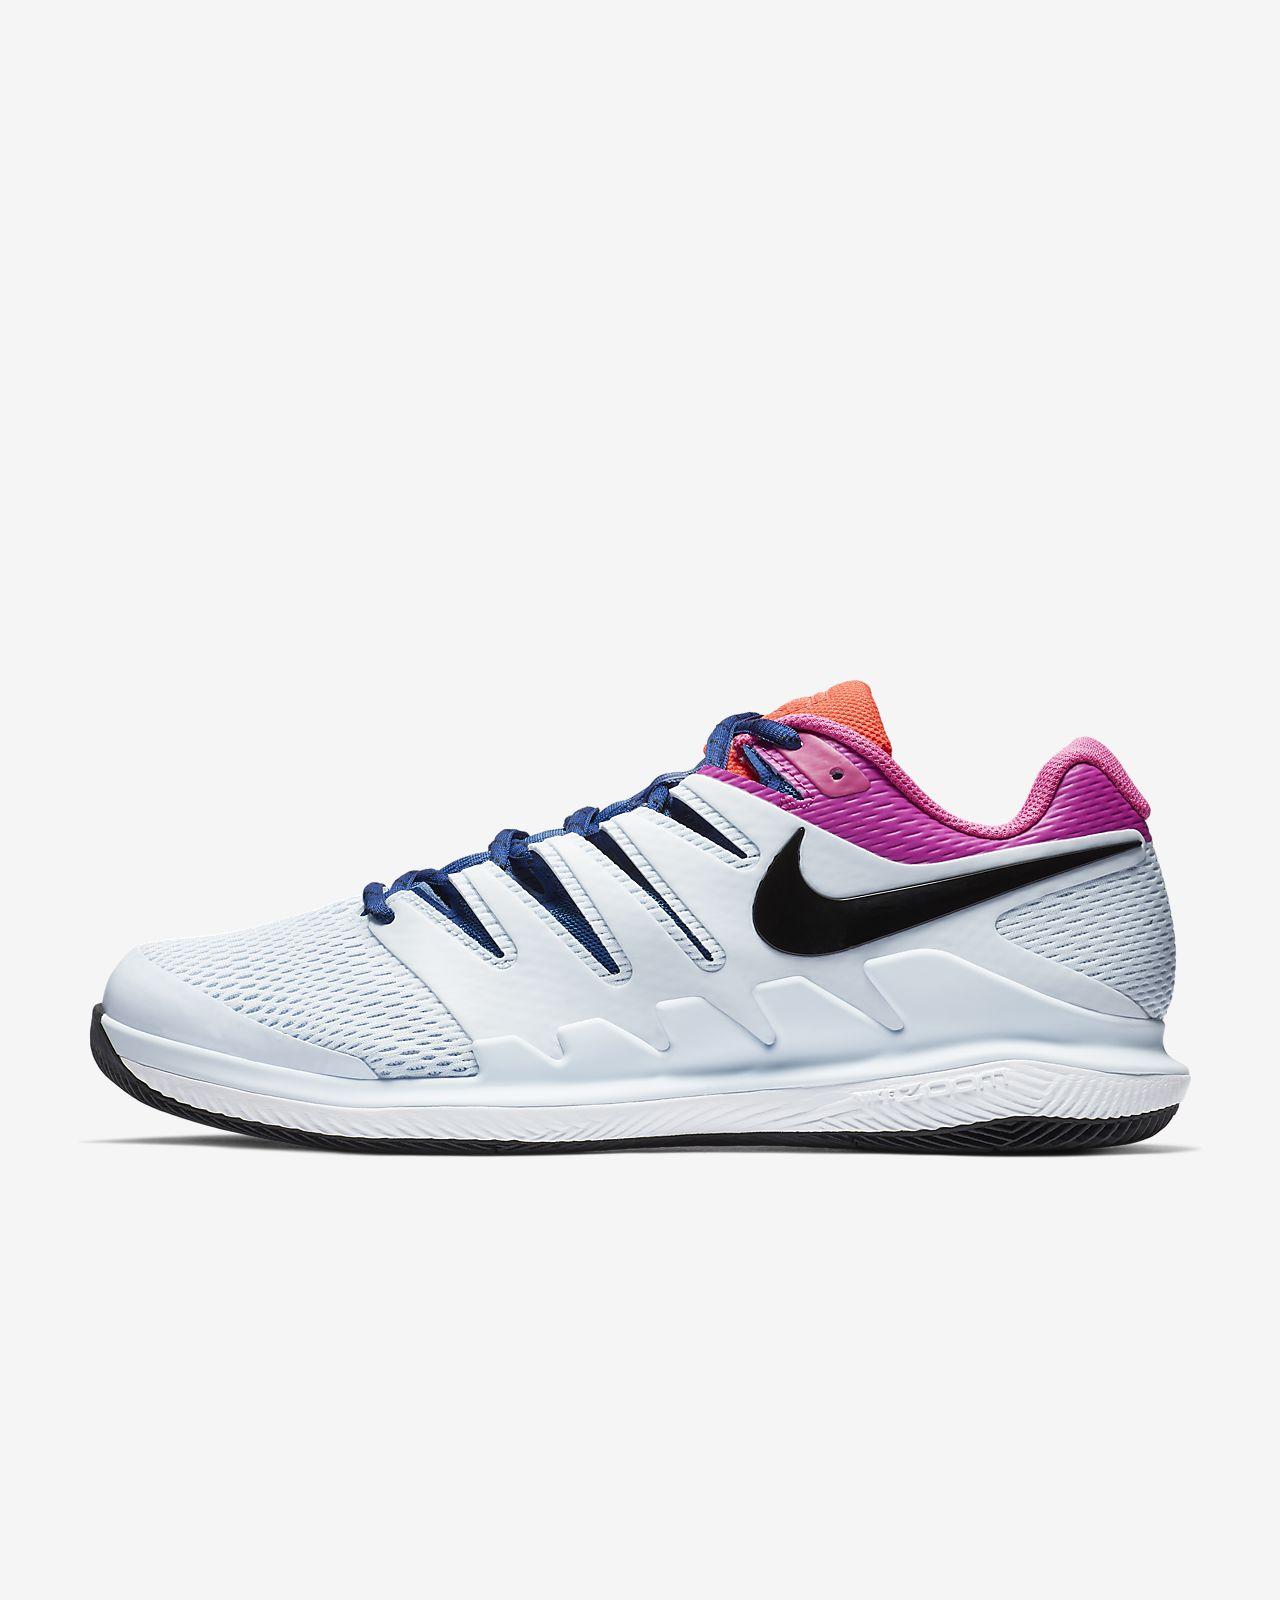 ... Calzado de tenis de cancha dura para hombre NikeCourt Air Zoom Vapor X db9f3522f28af